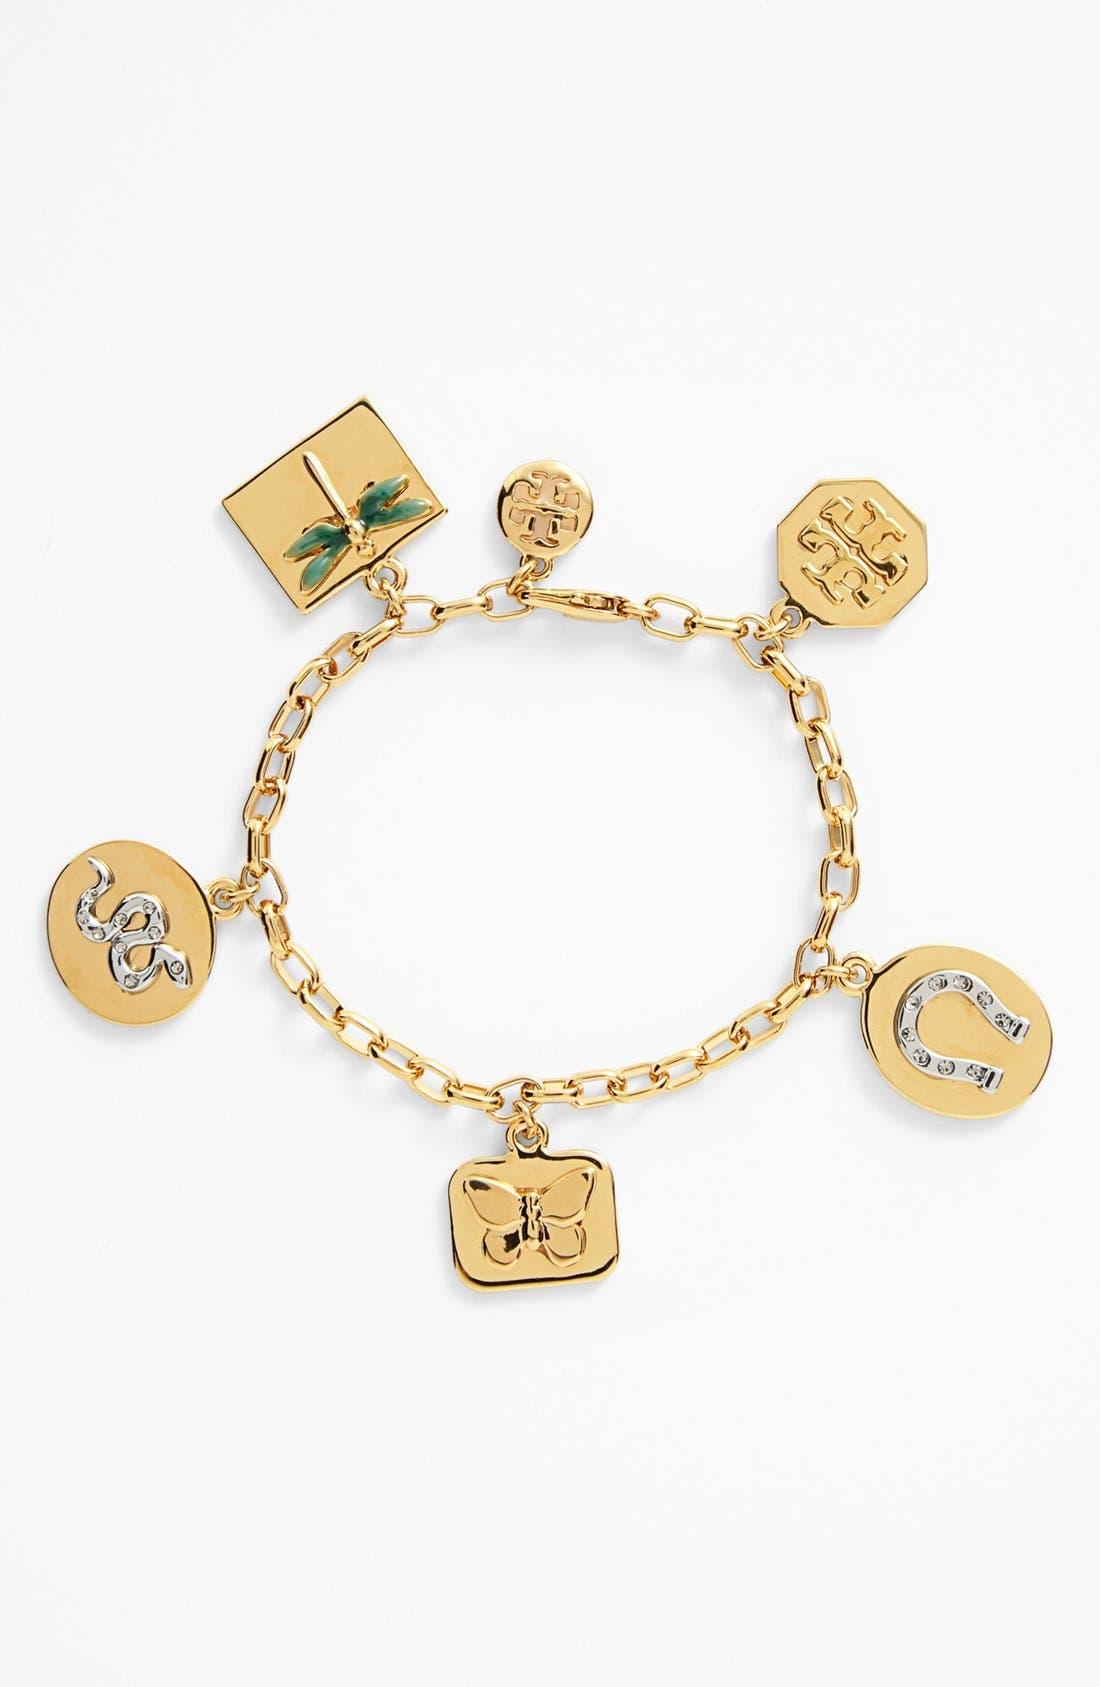 Main Image - Tory Burch 'Sylbie' Charm Bracelet